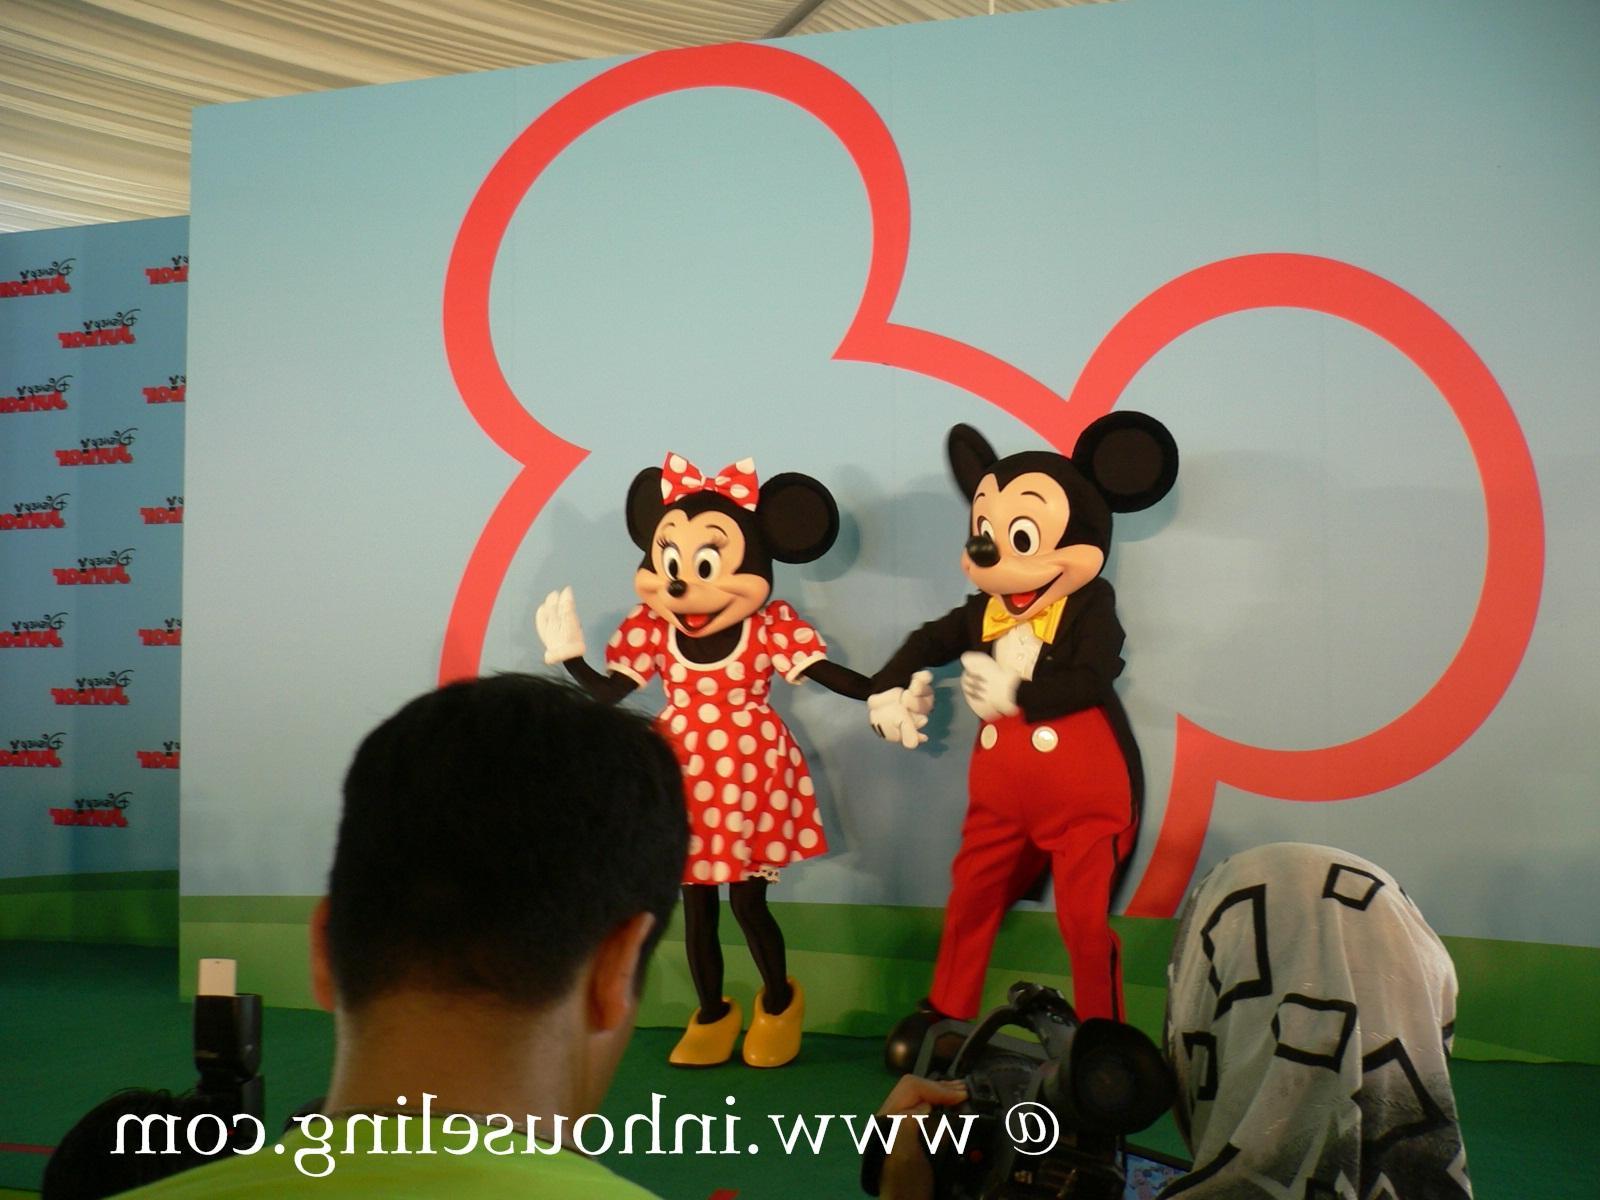 Mickey and Minnie, how i wish